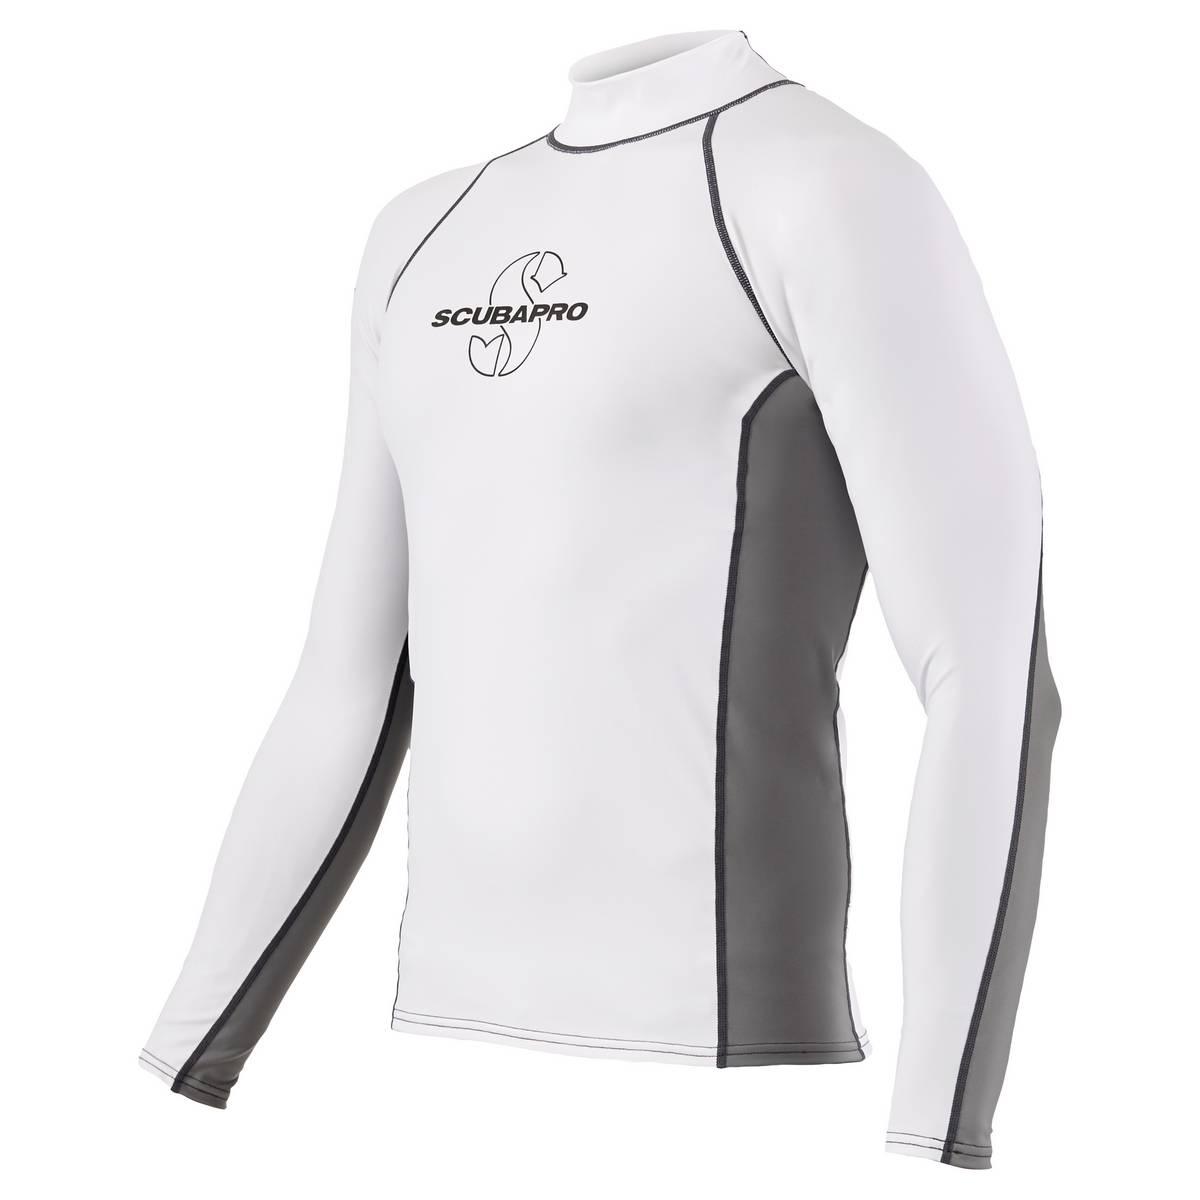 ScubaPro T-Flex Rashguard Men White and Grey - X63187